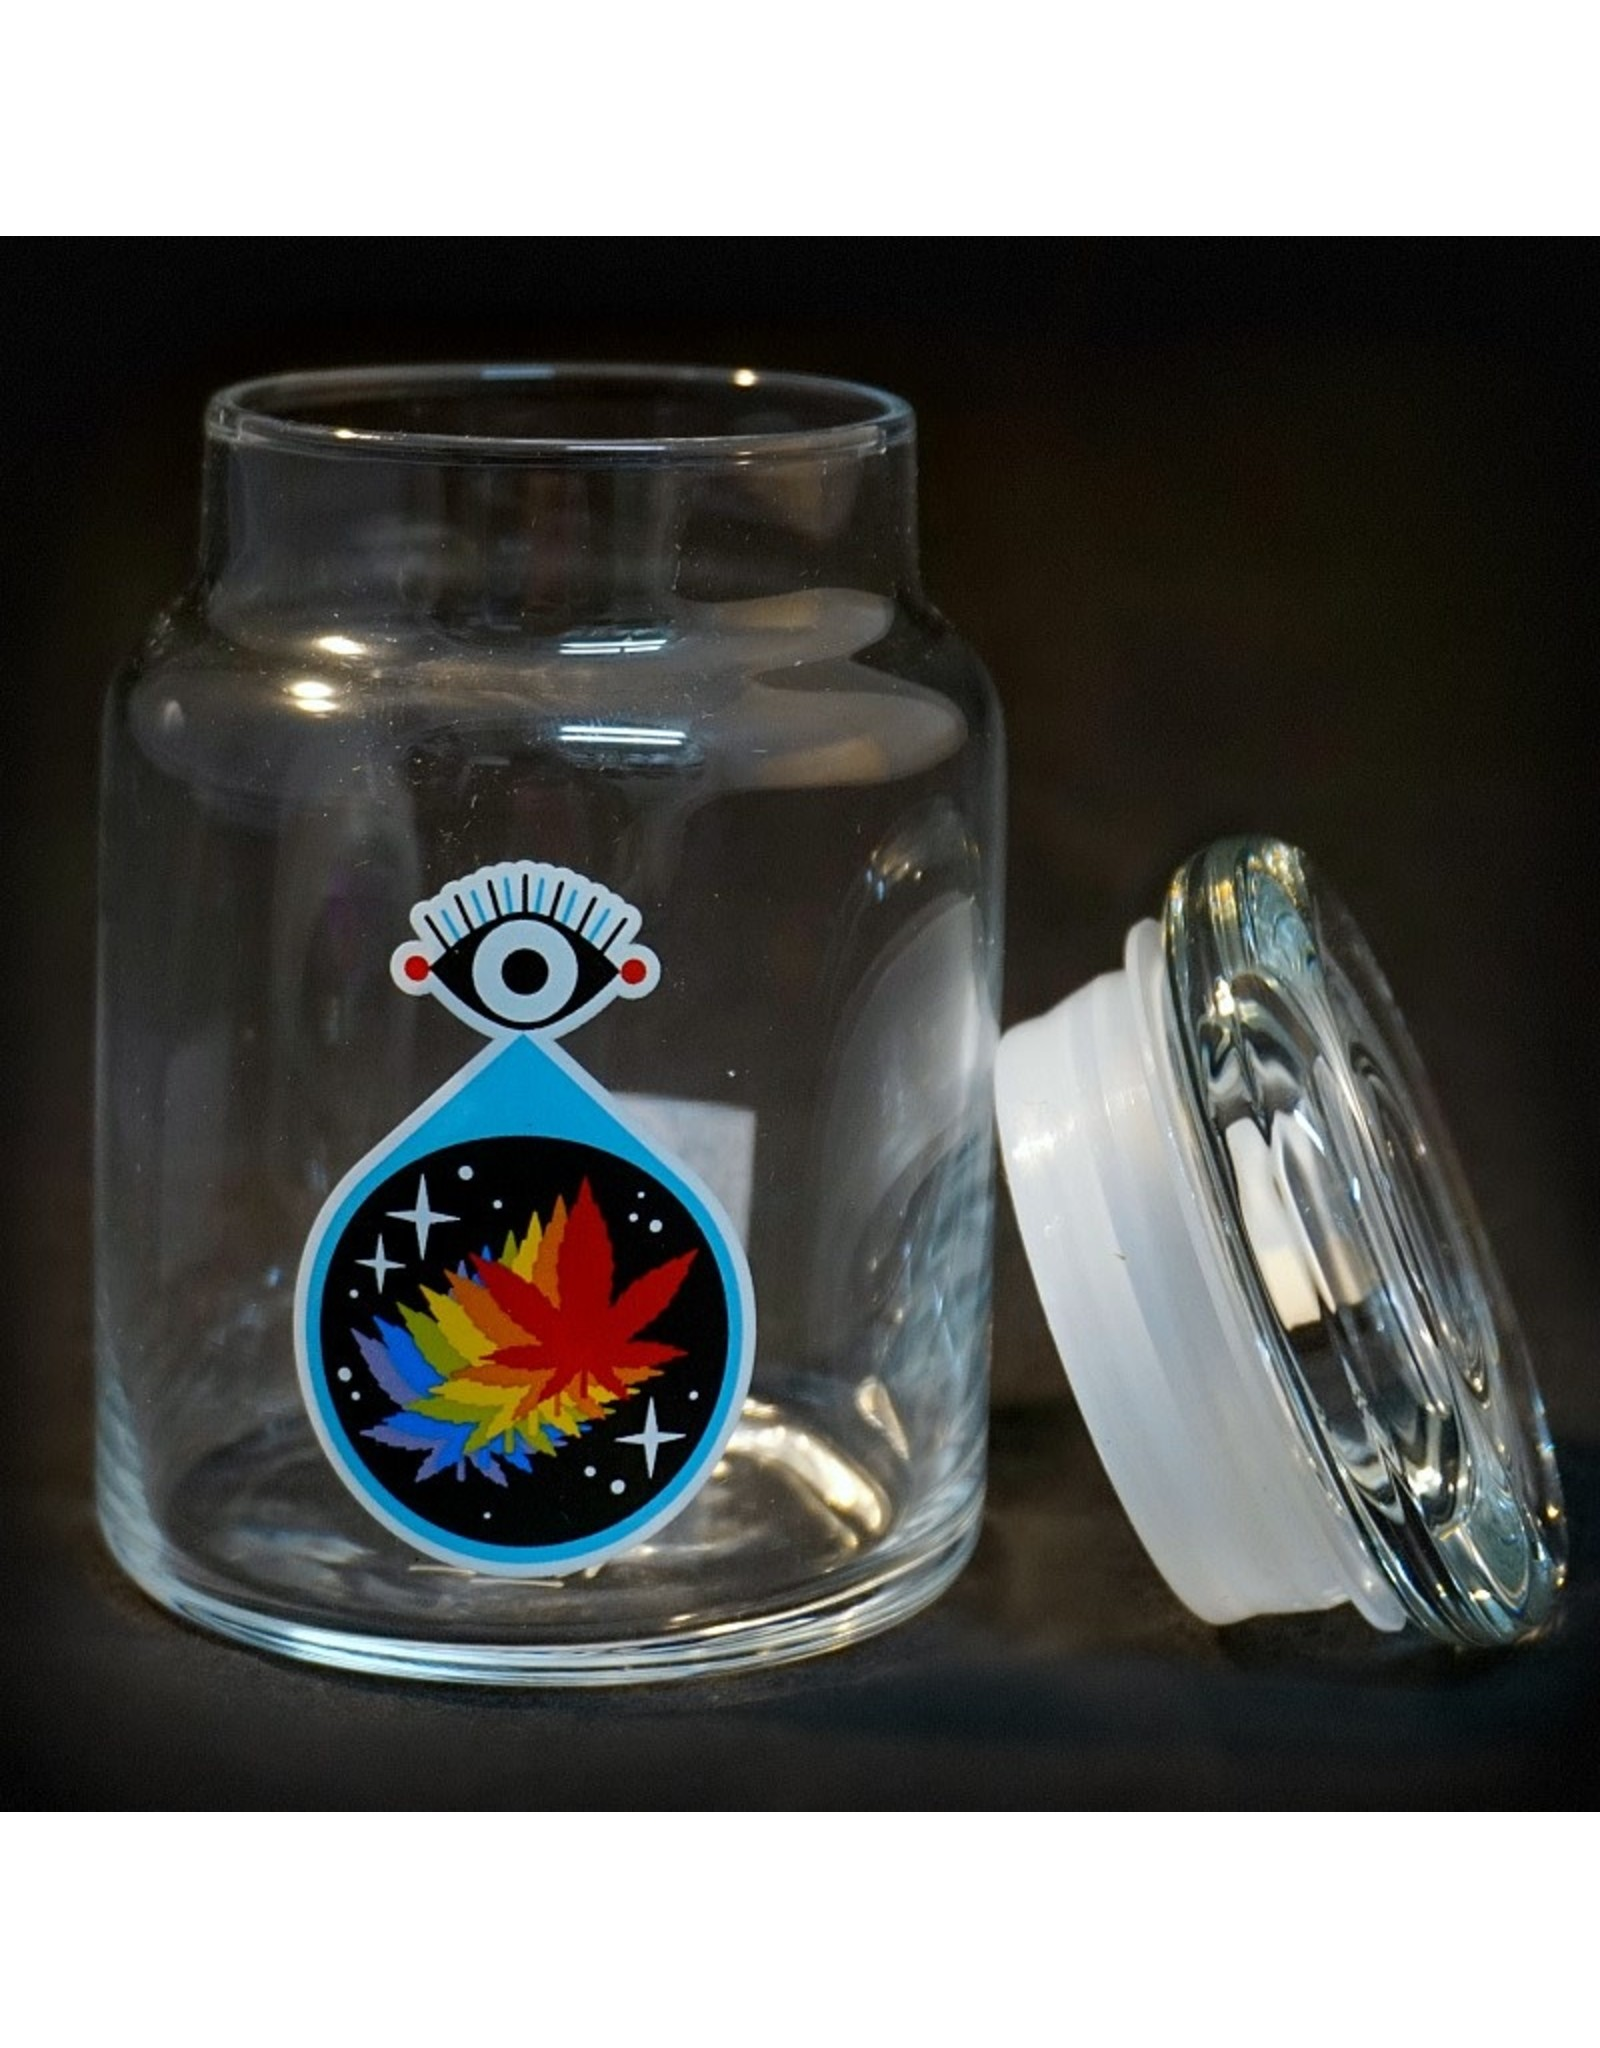 420 Science 420 Science Jars Small All Seeing Leaf Pop Top